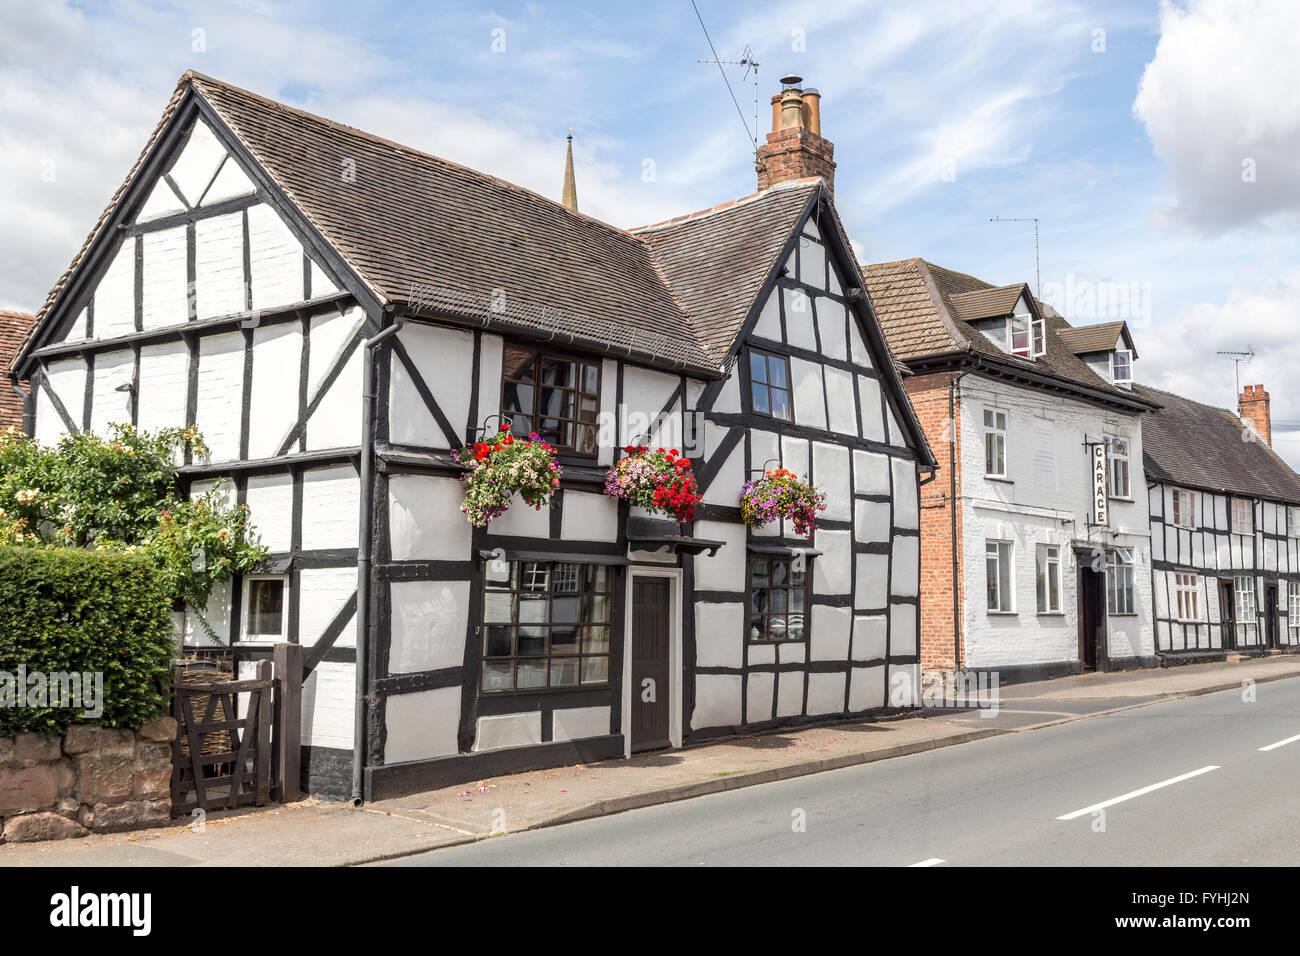 Tudor houses, Ombersley, Worcestershire, England, UK - Stock Image